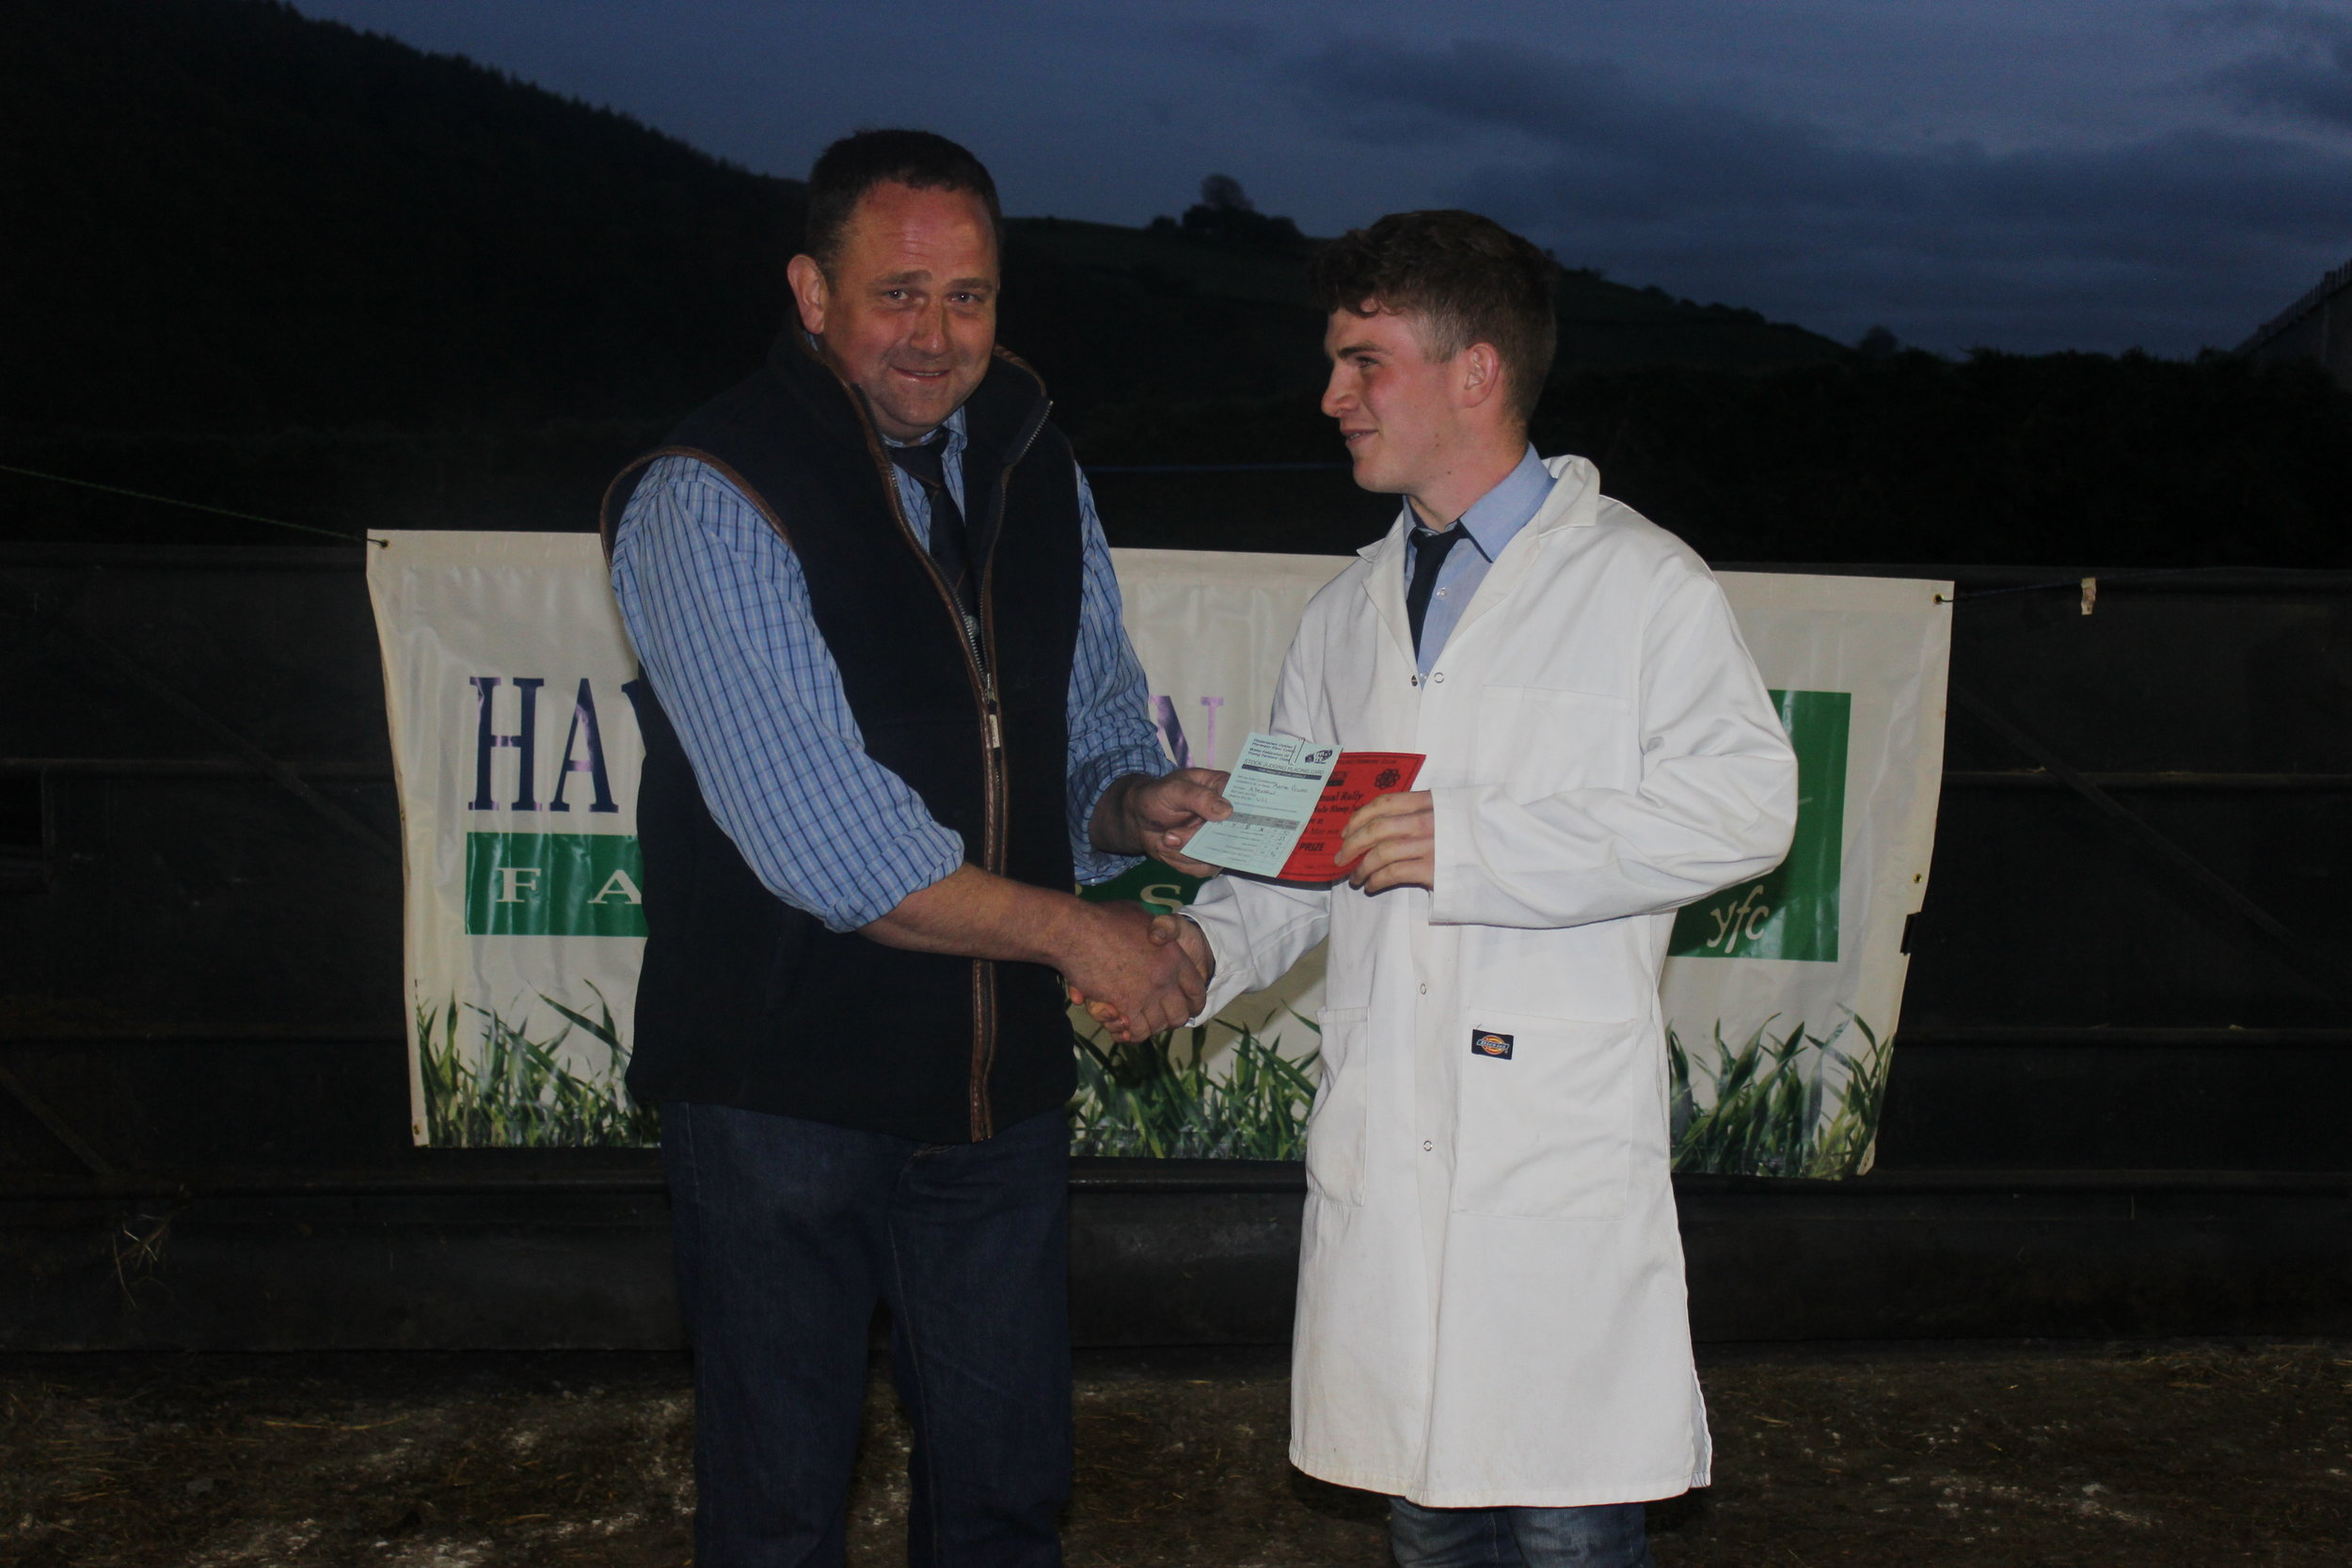 Aeron Powell, Aberedw YFC - 1st place in Under 21 Welsh Mule Stockjudging with Judge Geoff Probert.